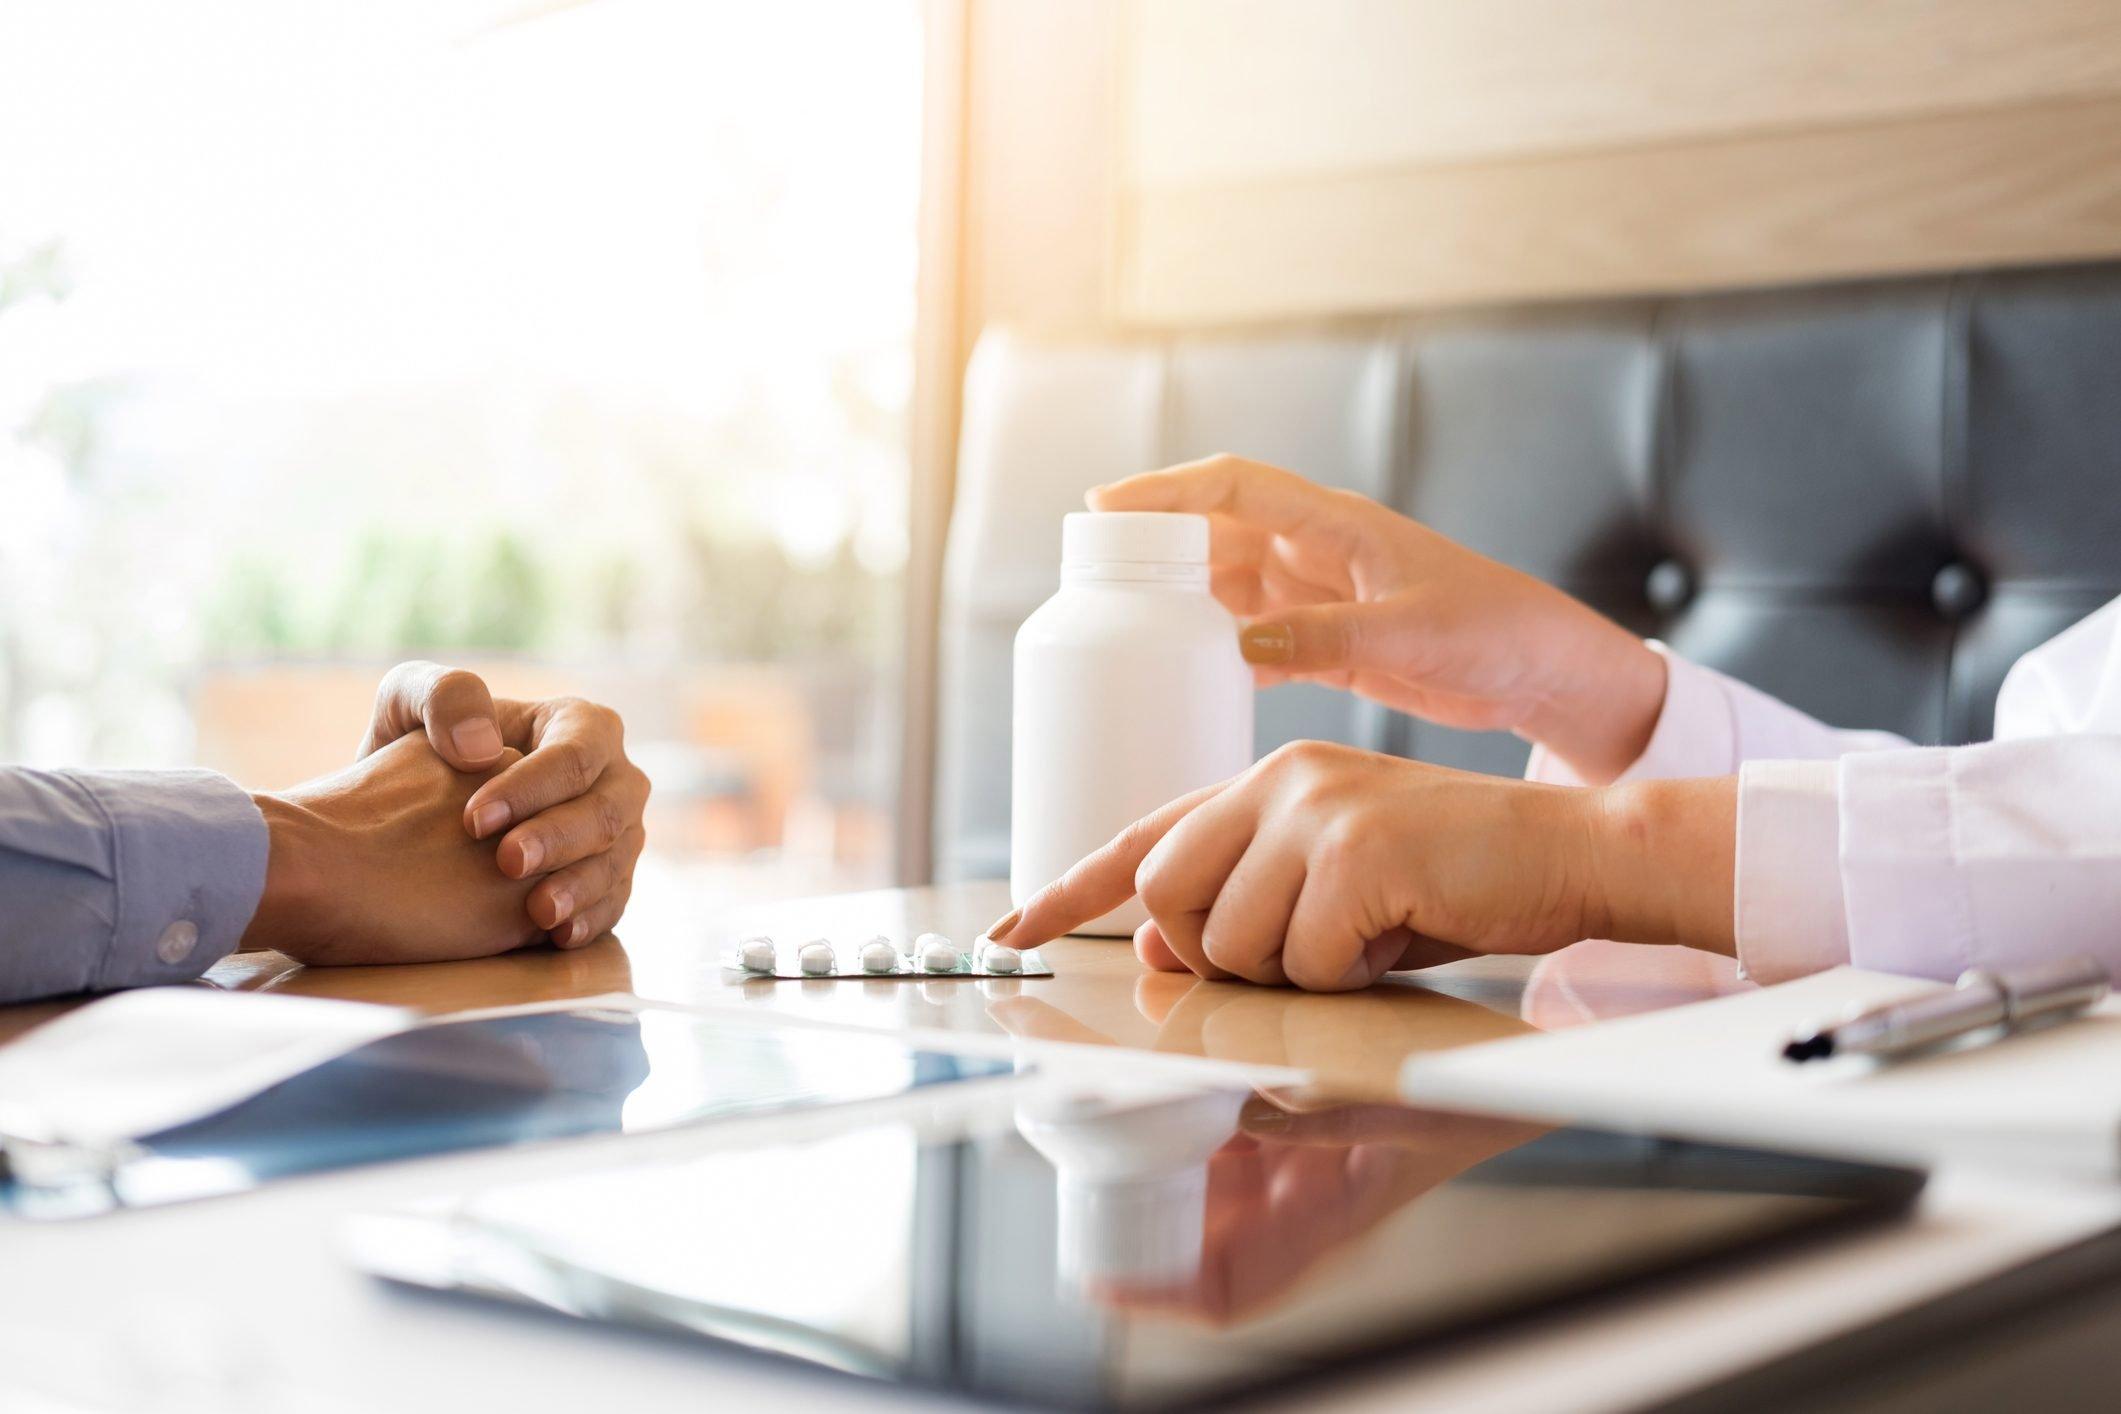 Cropped Hands Of Doctor Prescribing Medicine To Patient On Desk